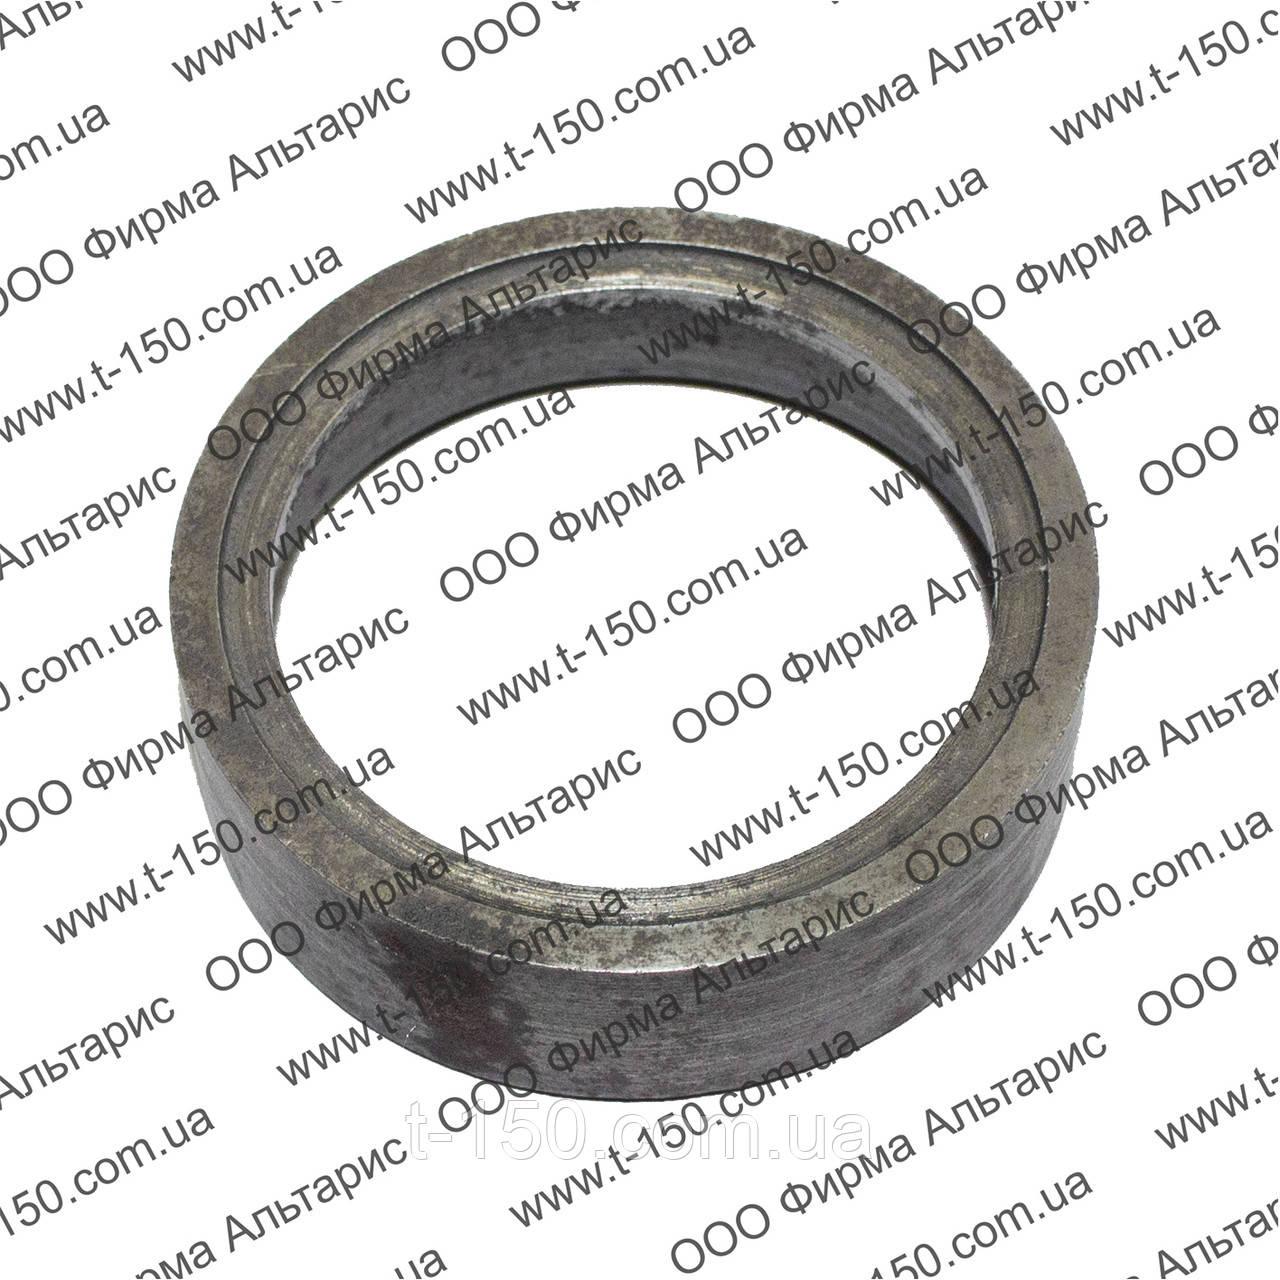 Заглушка водила (кольцо) ДТ-75, 77.38.118-1